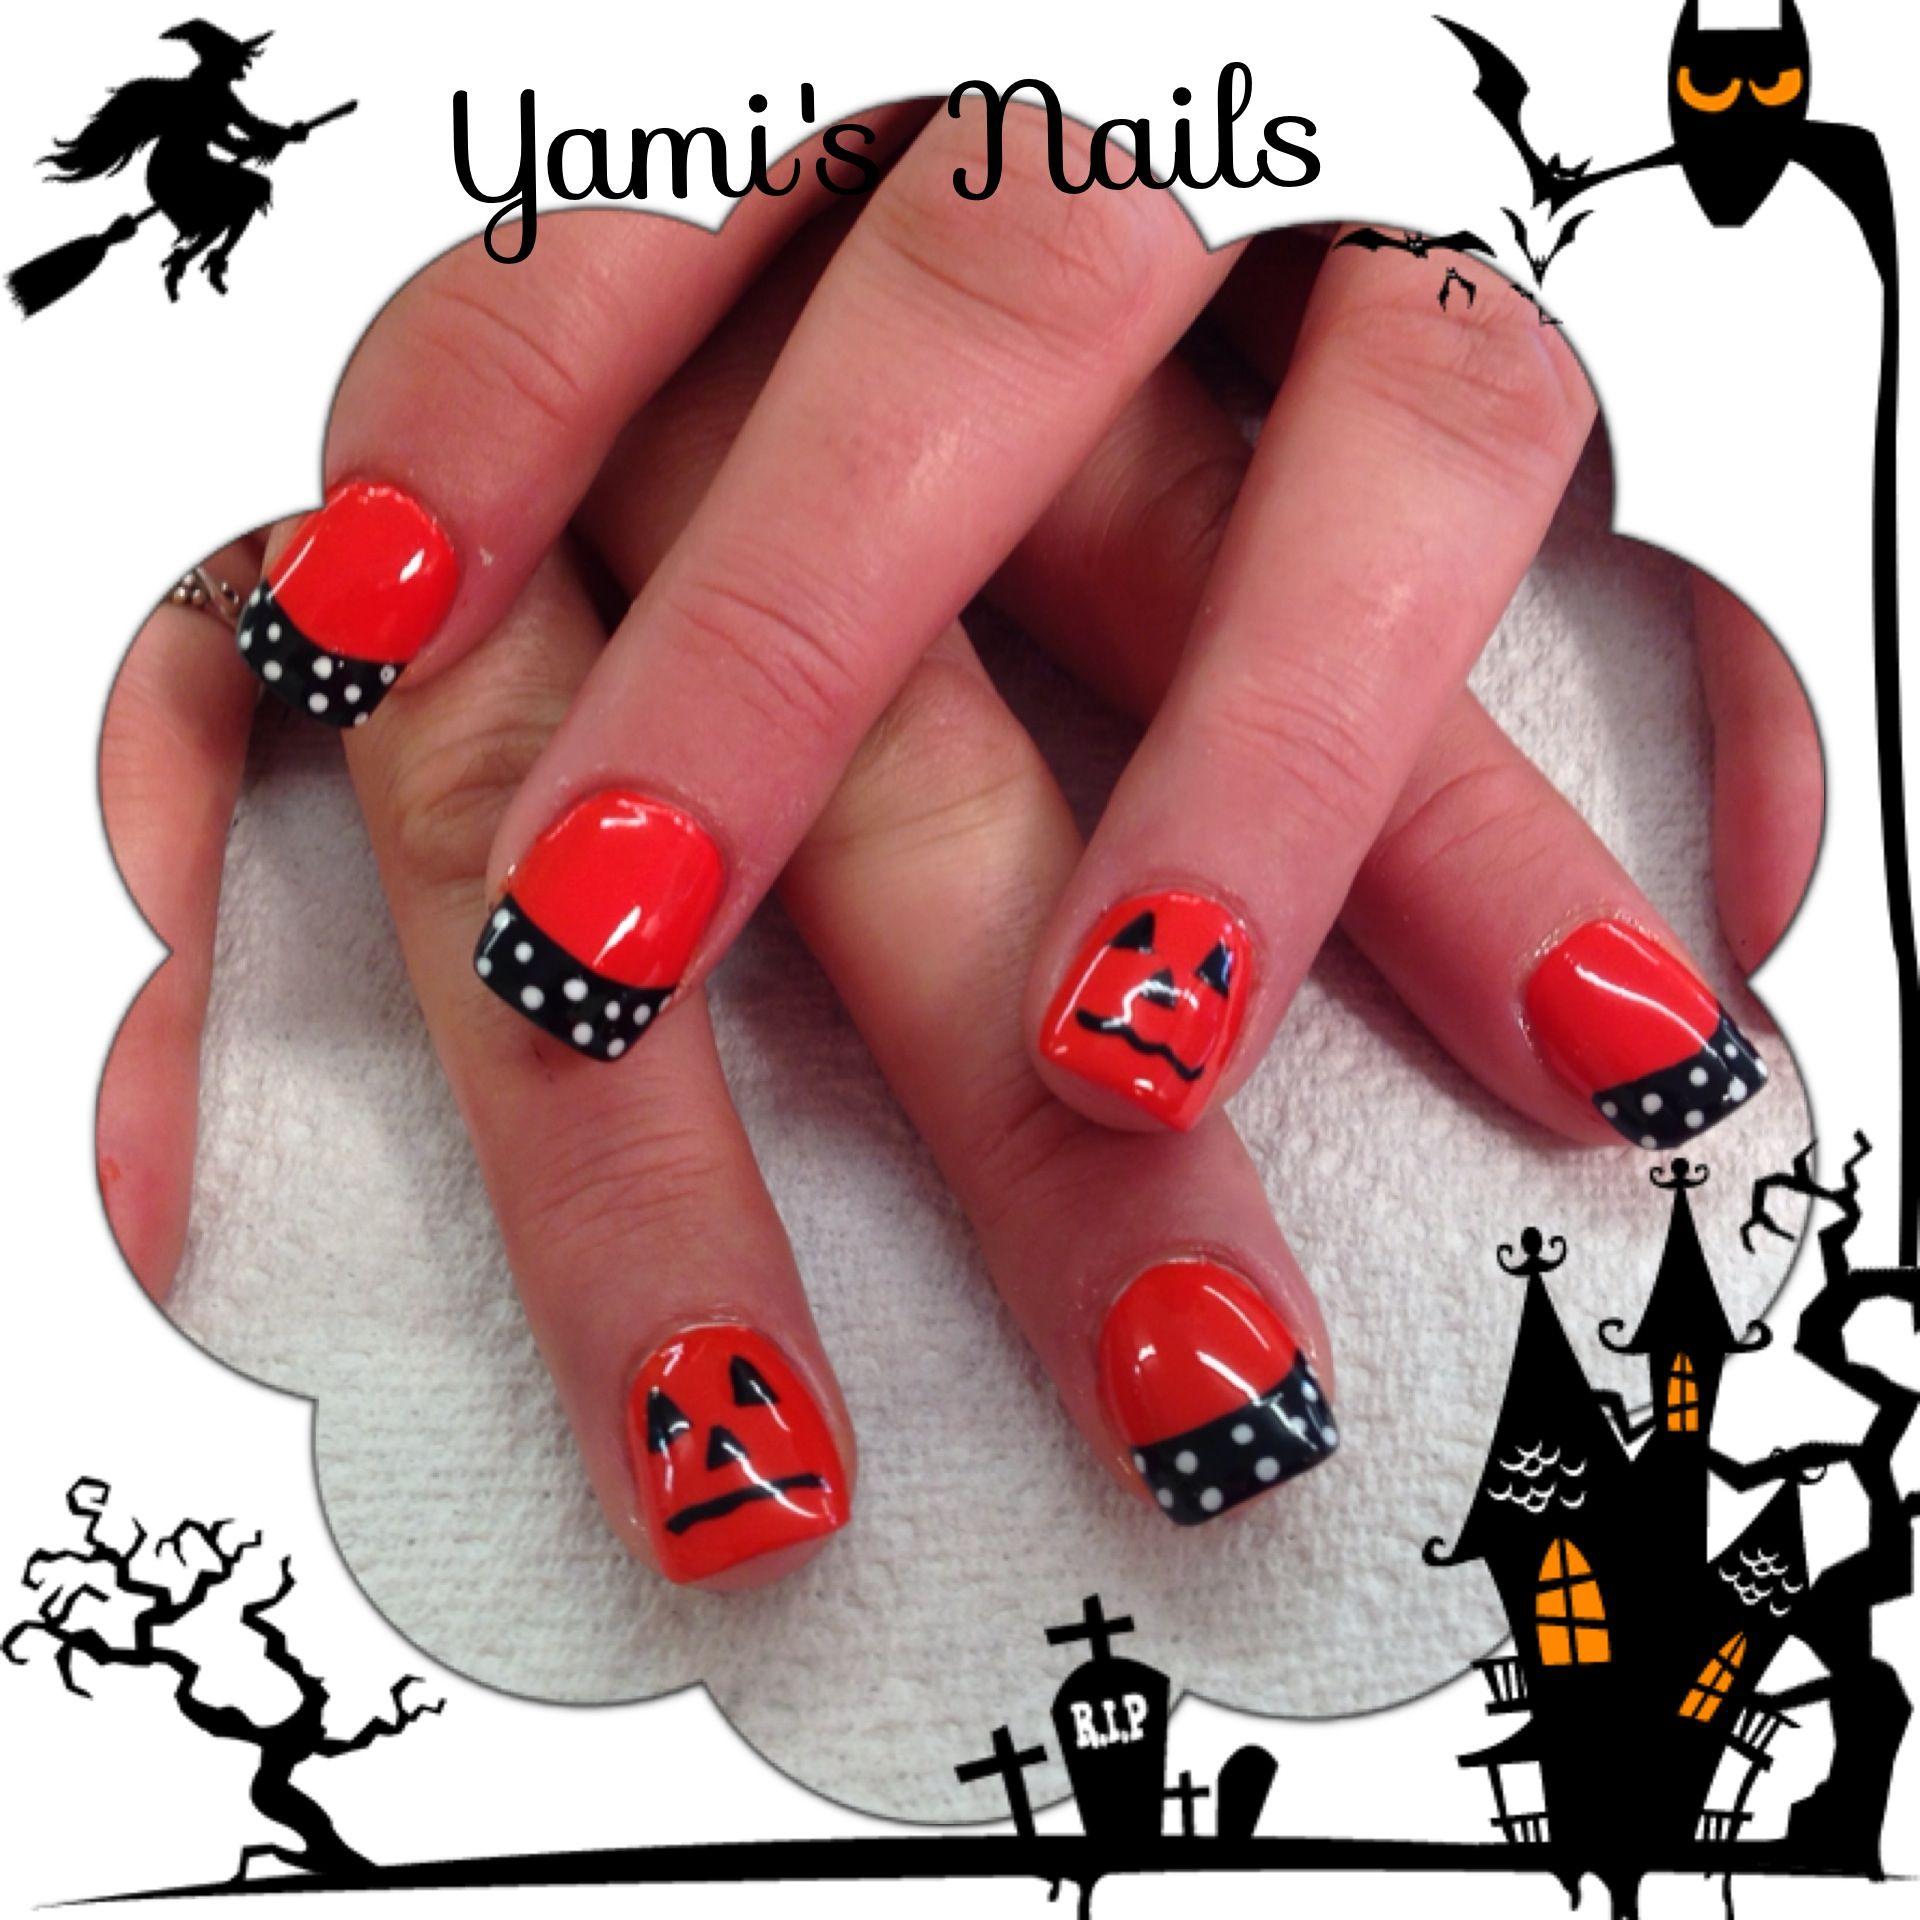 Halloween nail art shellac | Nails original | Pinterest ...